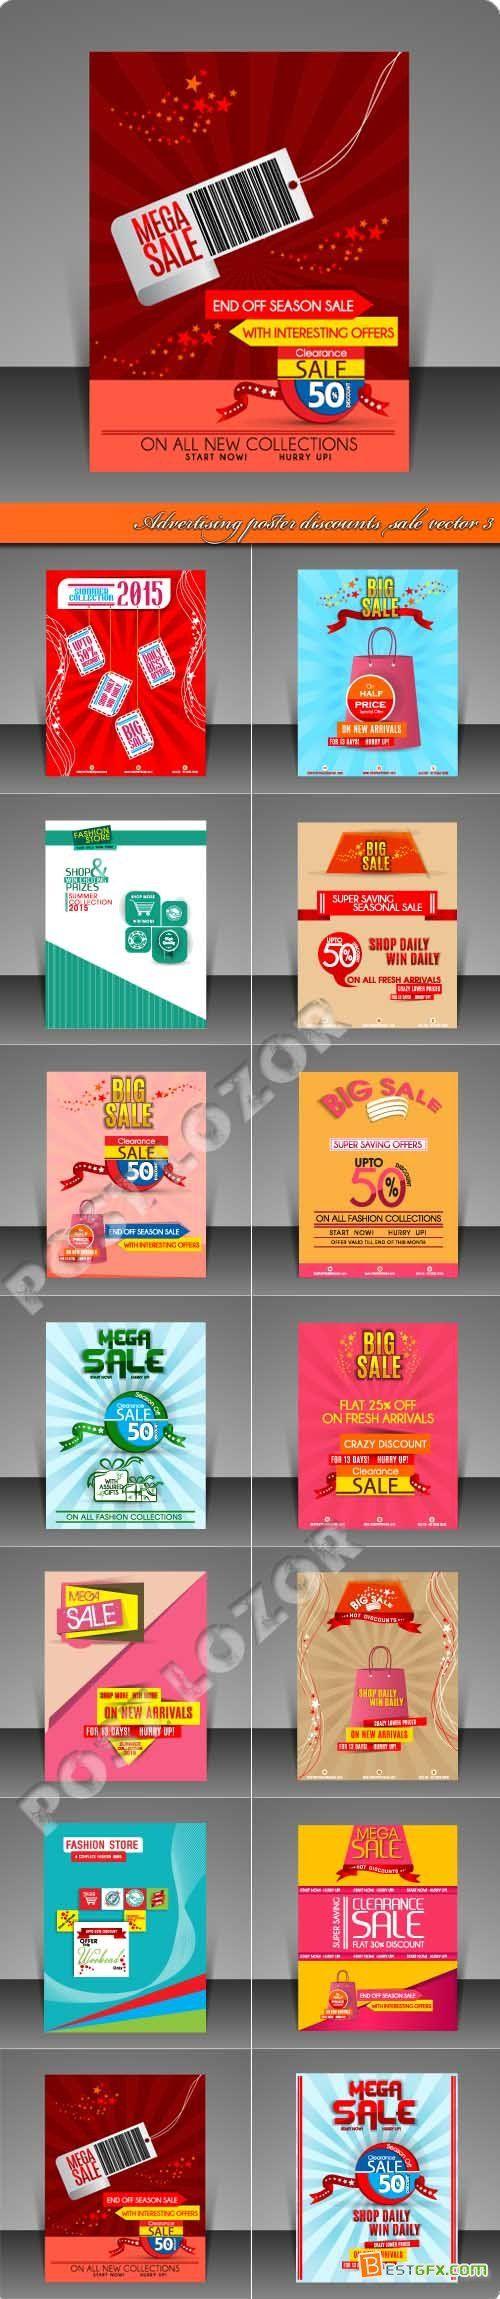 Design large banner in illustrator - Advertising Poster Discounts Sale Vector 3